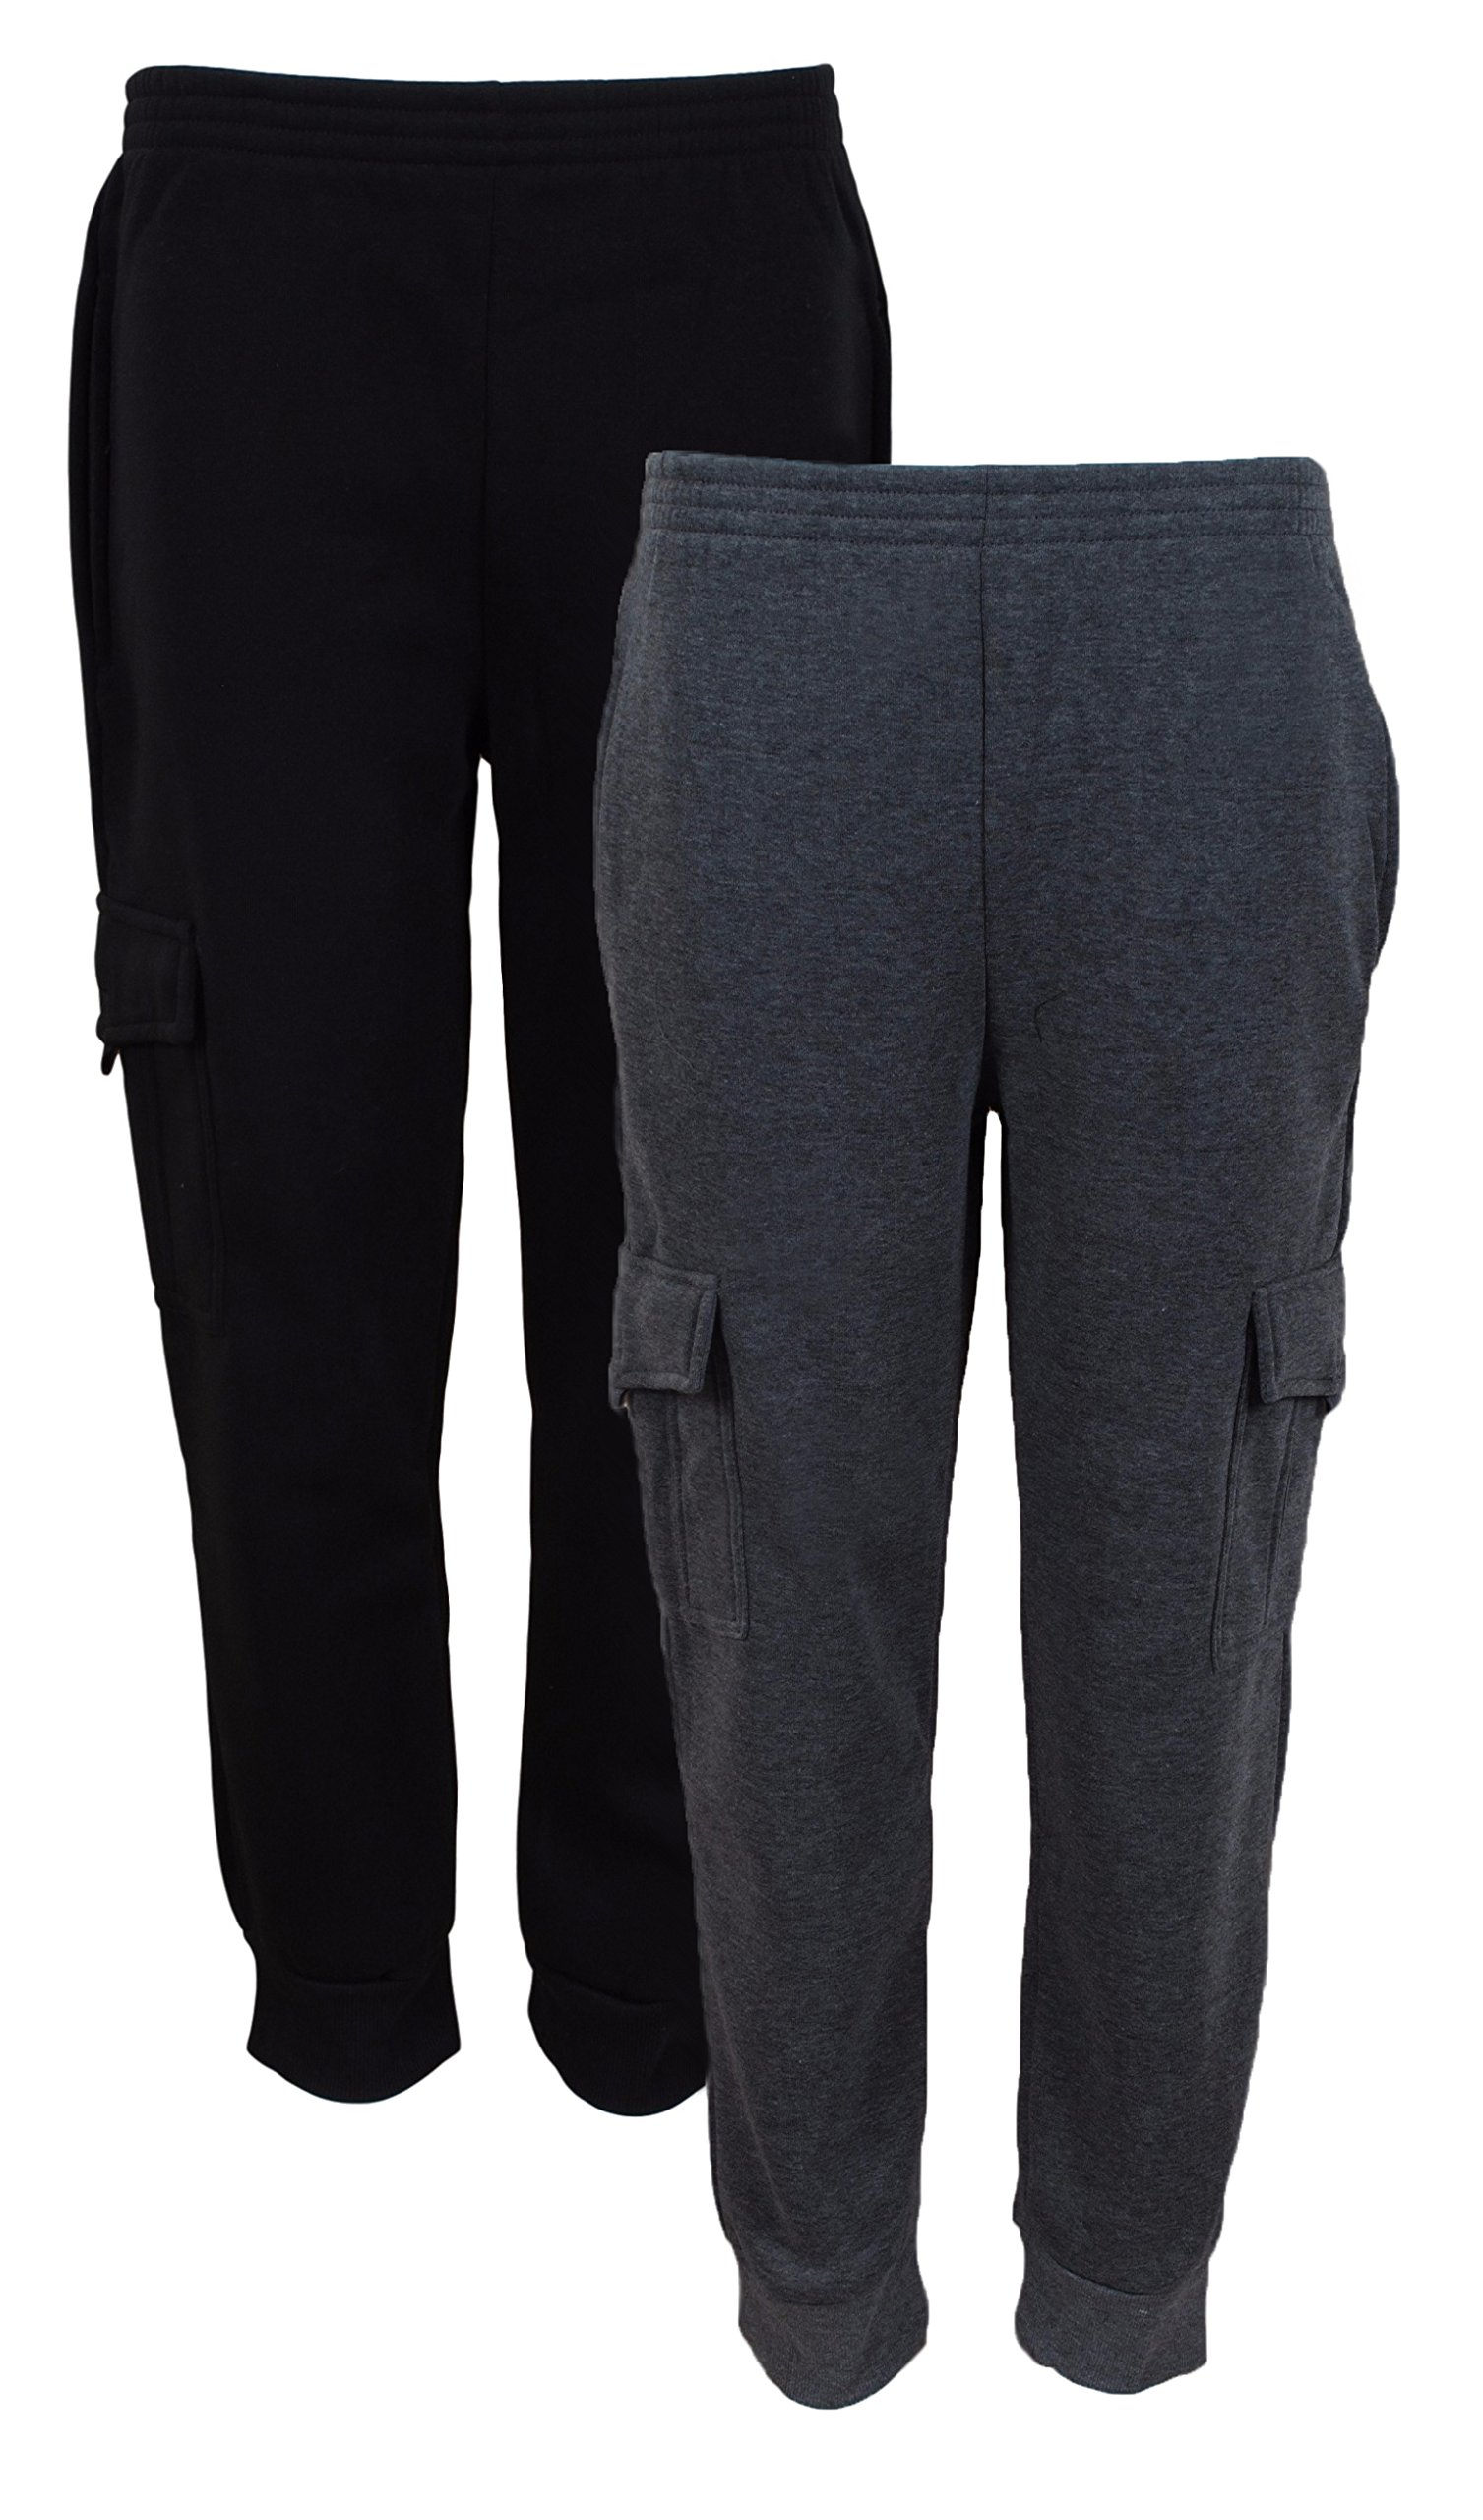 Quad Seven 2 件装男童抓绒工慢跑运动裤